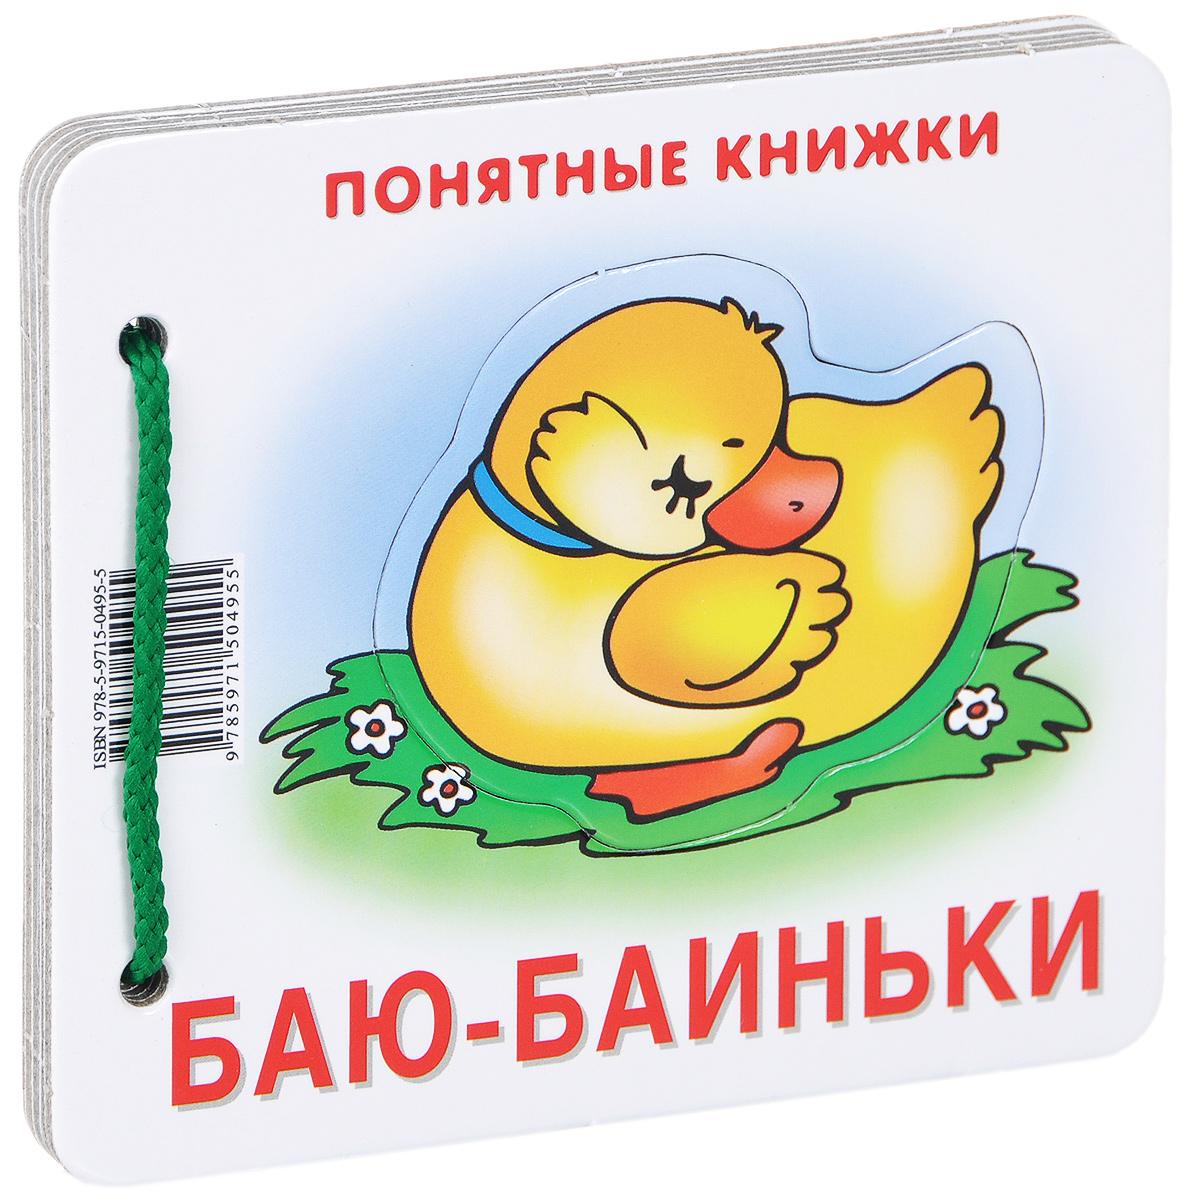 Баю-баиньки. Ирина Чекмарева,Сергей Савушкин